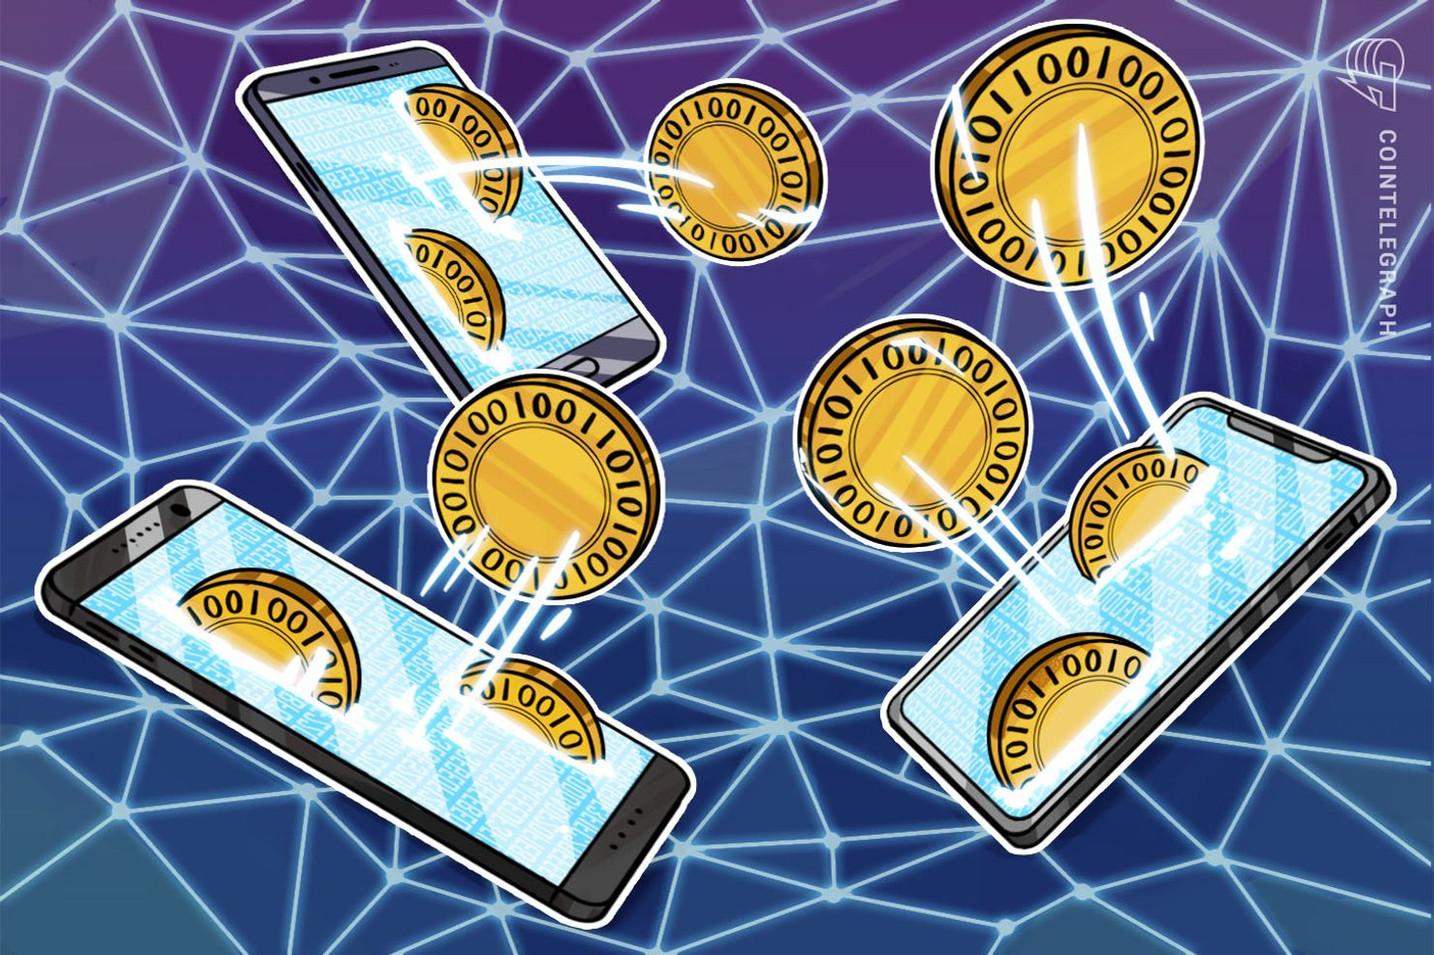 Empresa especializada en envíos de Bitcoin Cash vía SMS comenzó a operar en Colombia y República Dominicana